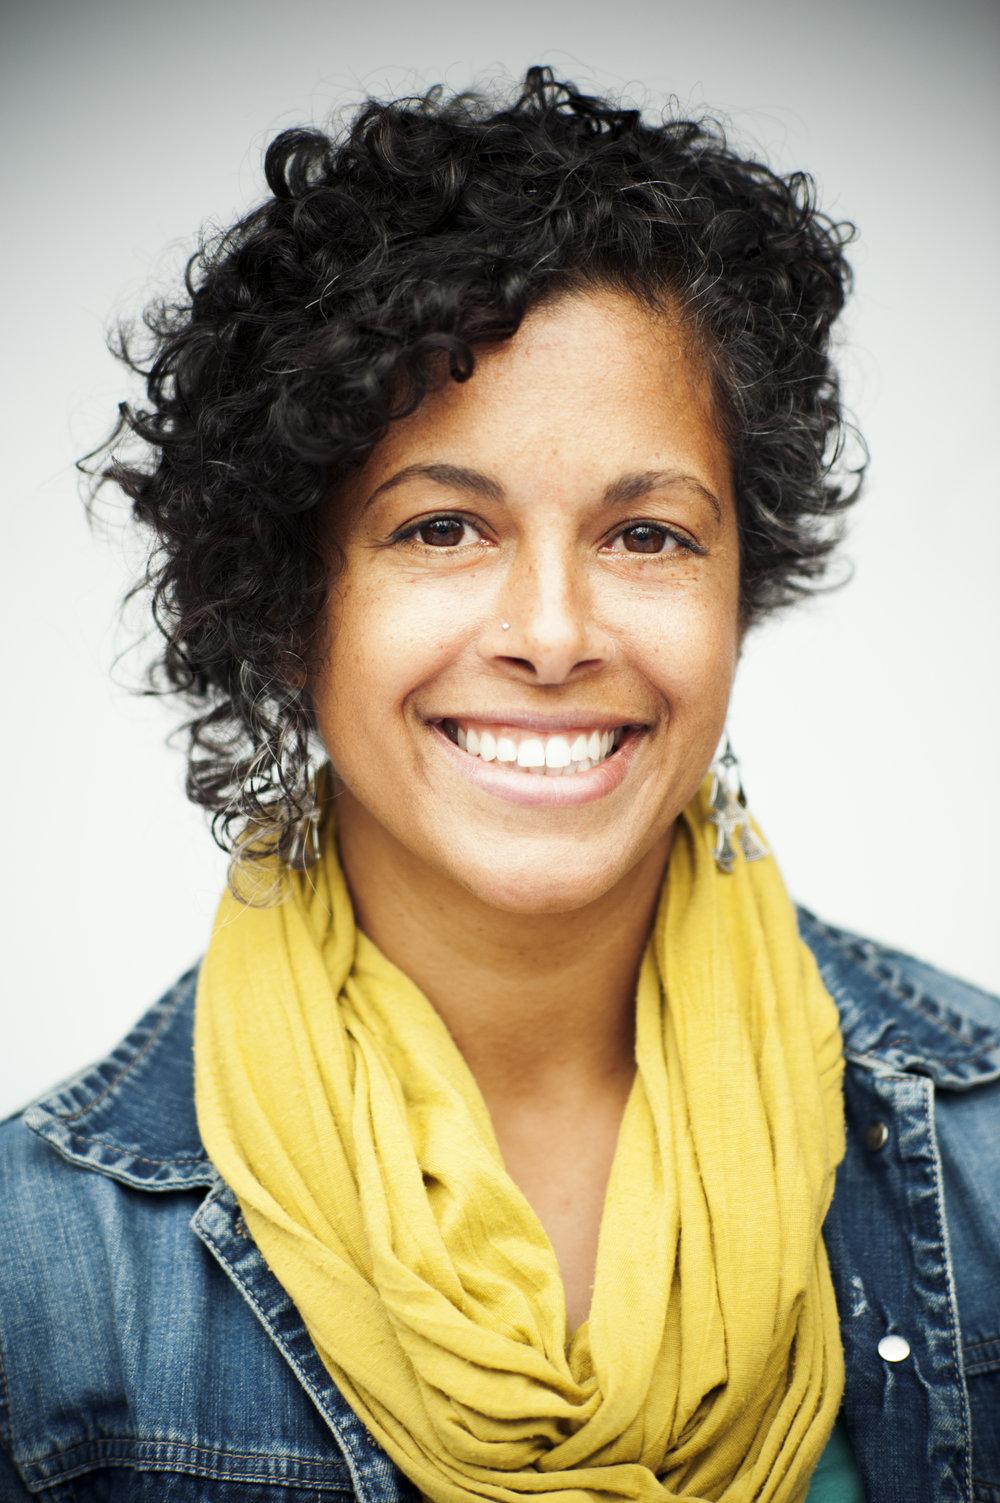 Nicolette Richer, founder of Richer Health Consulting &the Richer Health Retreat Centre